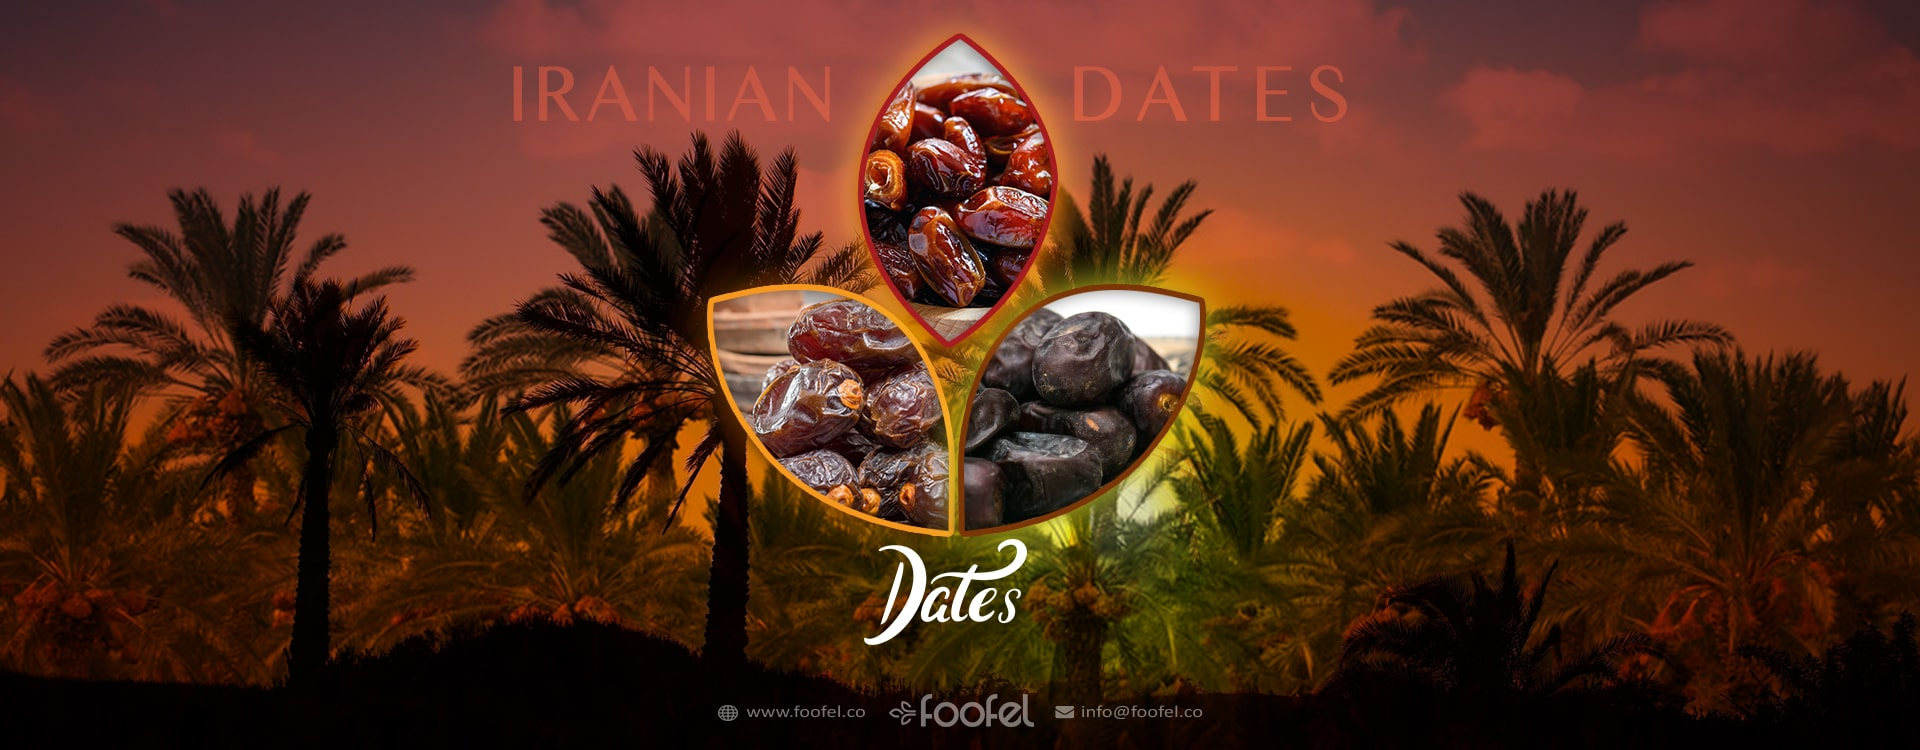 iranian dates،foofel